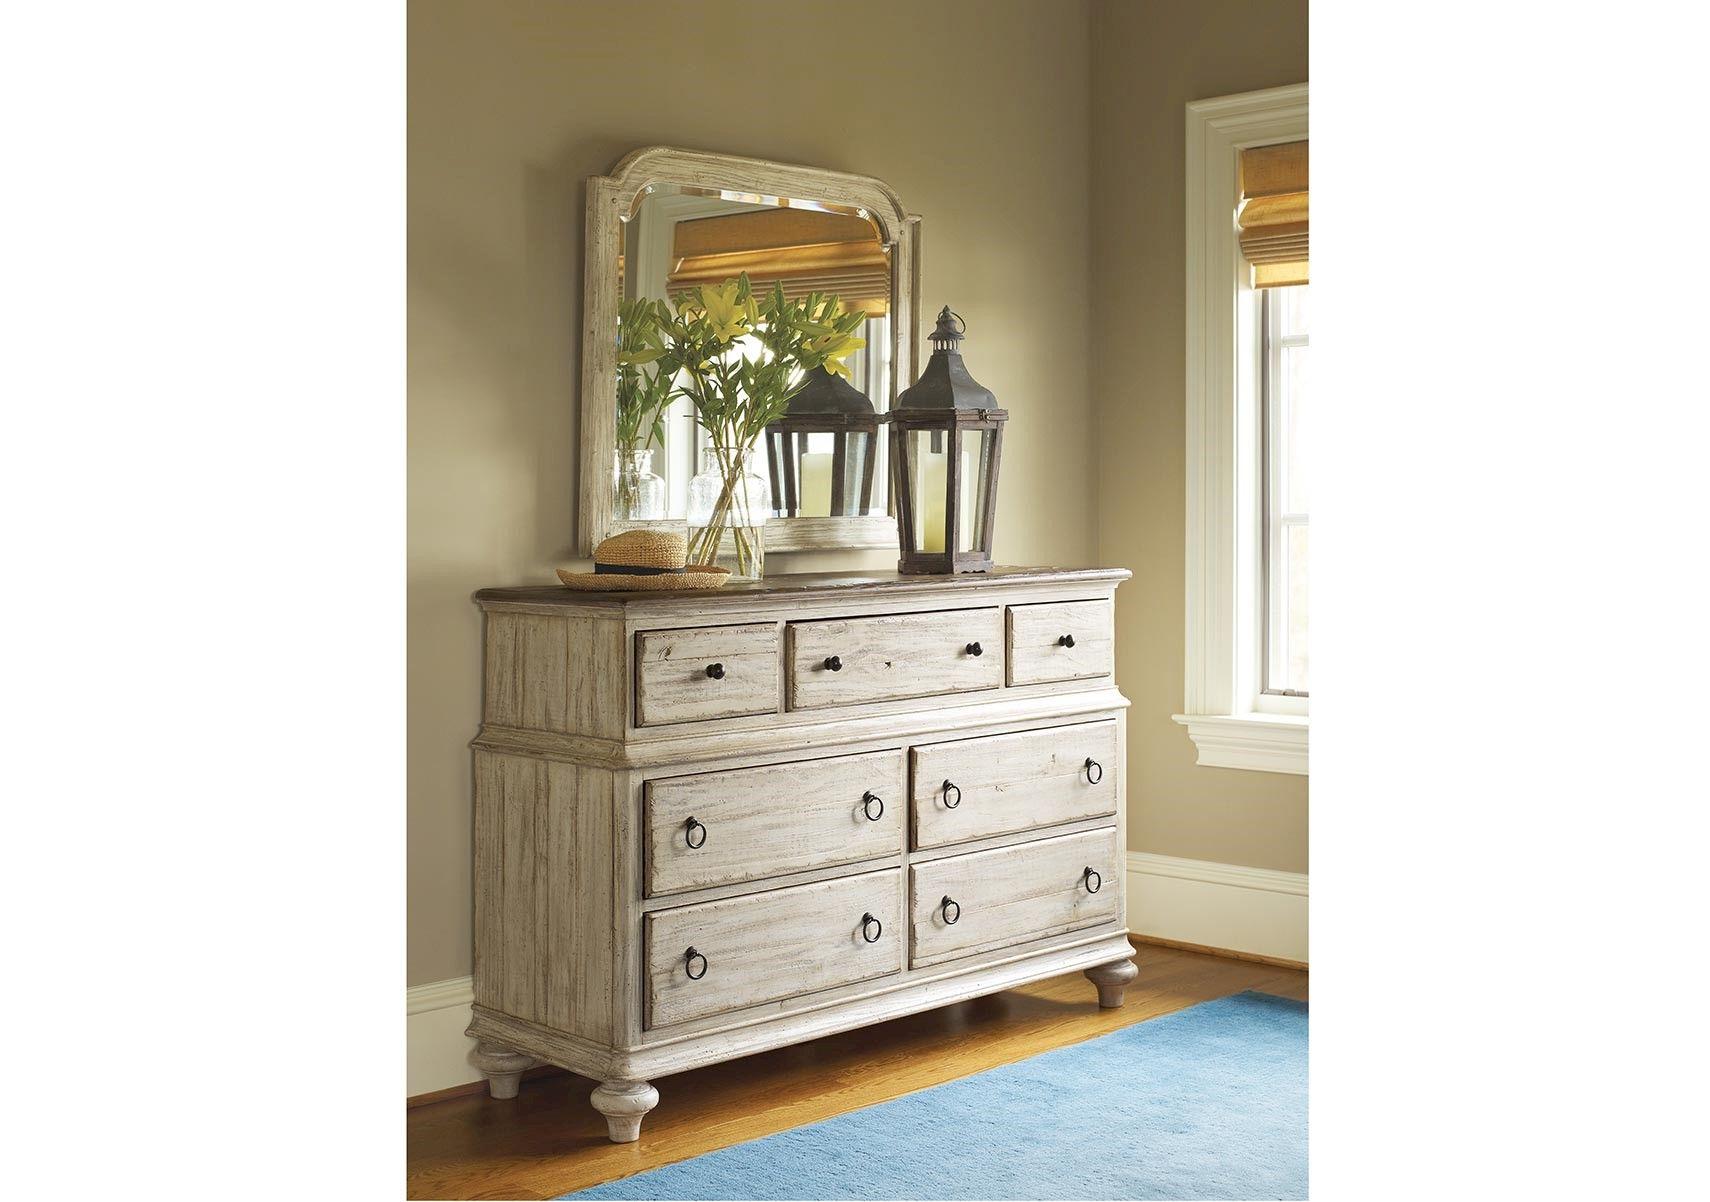 Lacks Weatherford 7Drawer Dresser and Mirror Kincaid